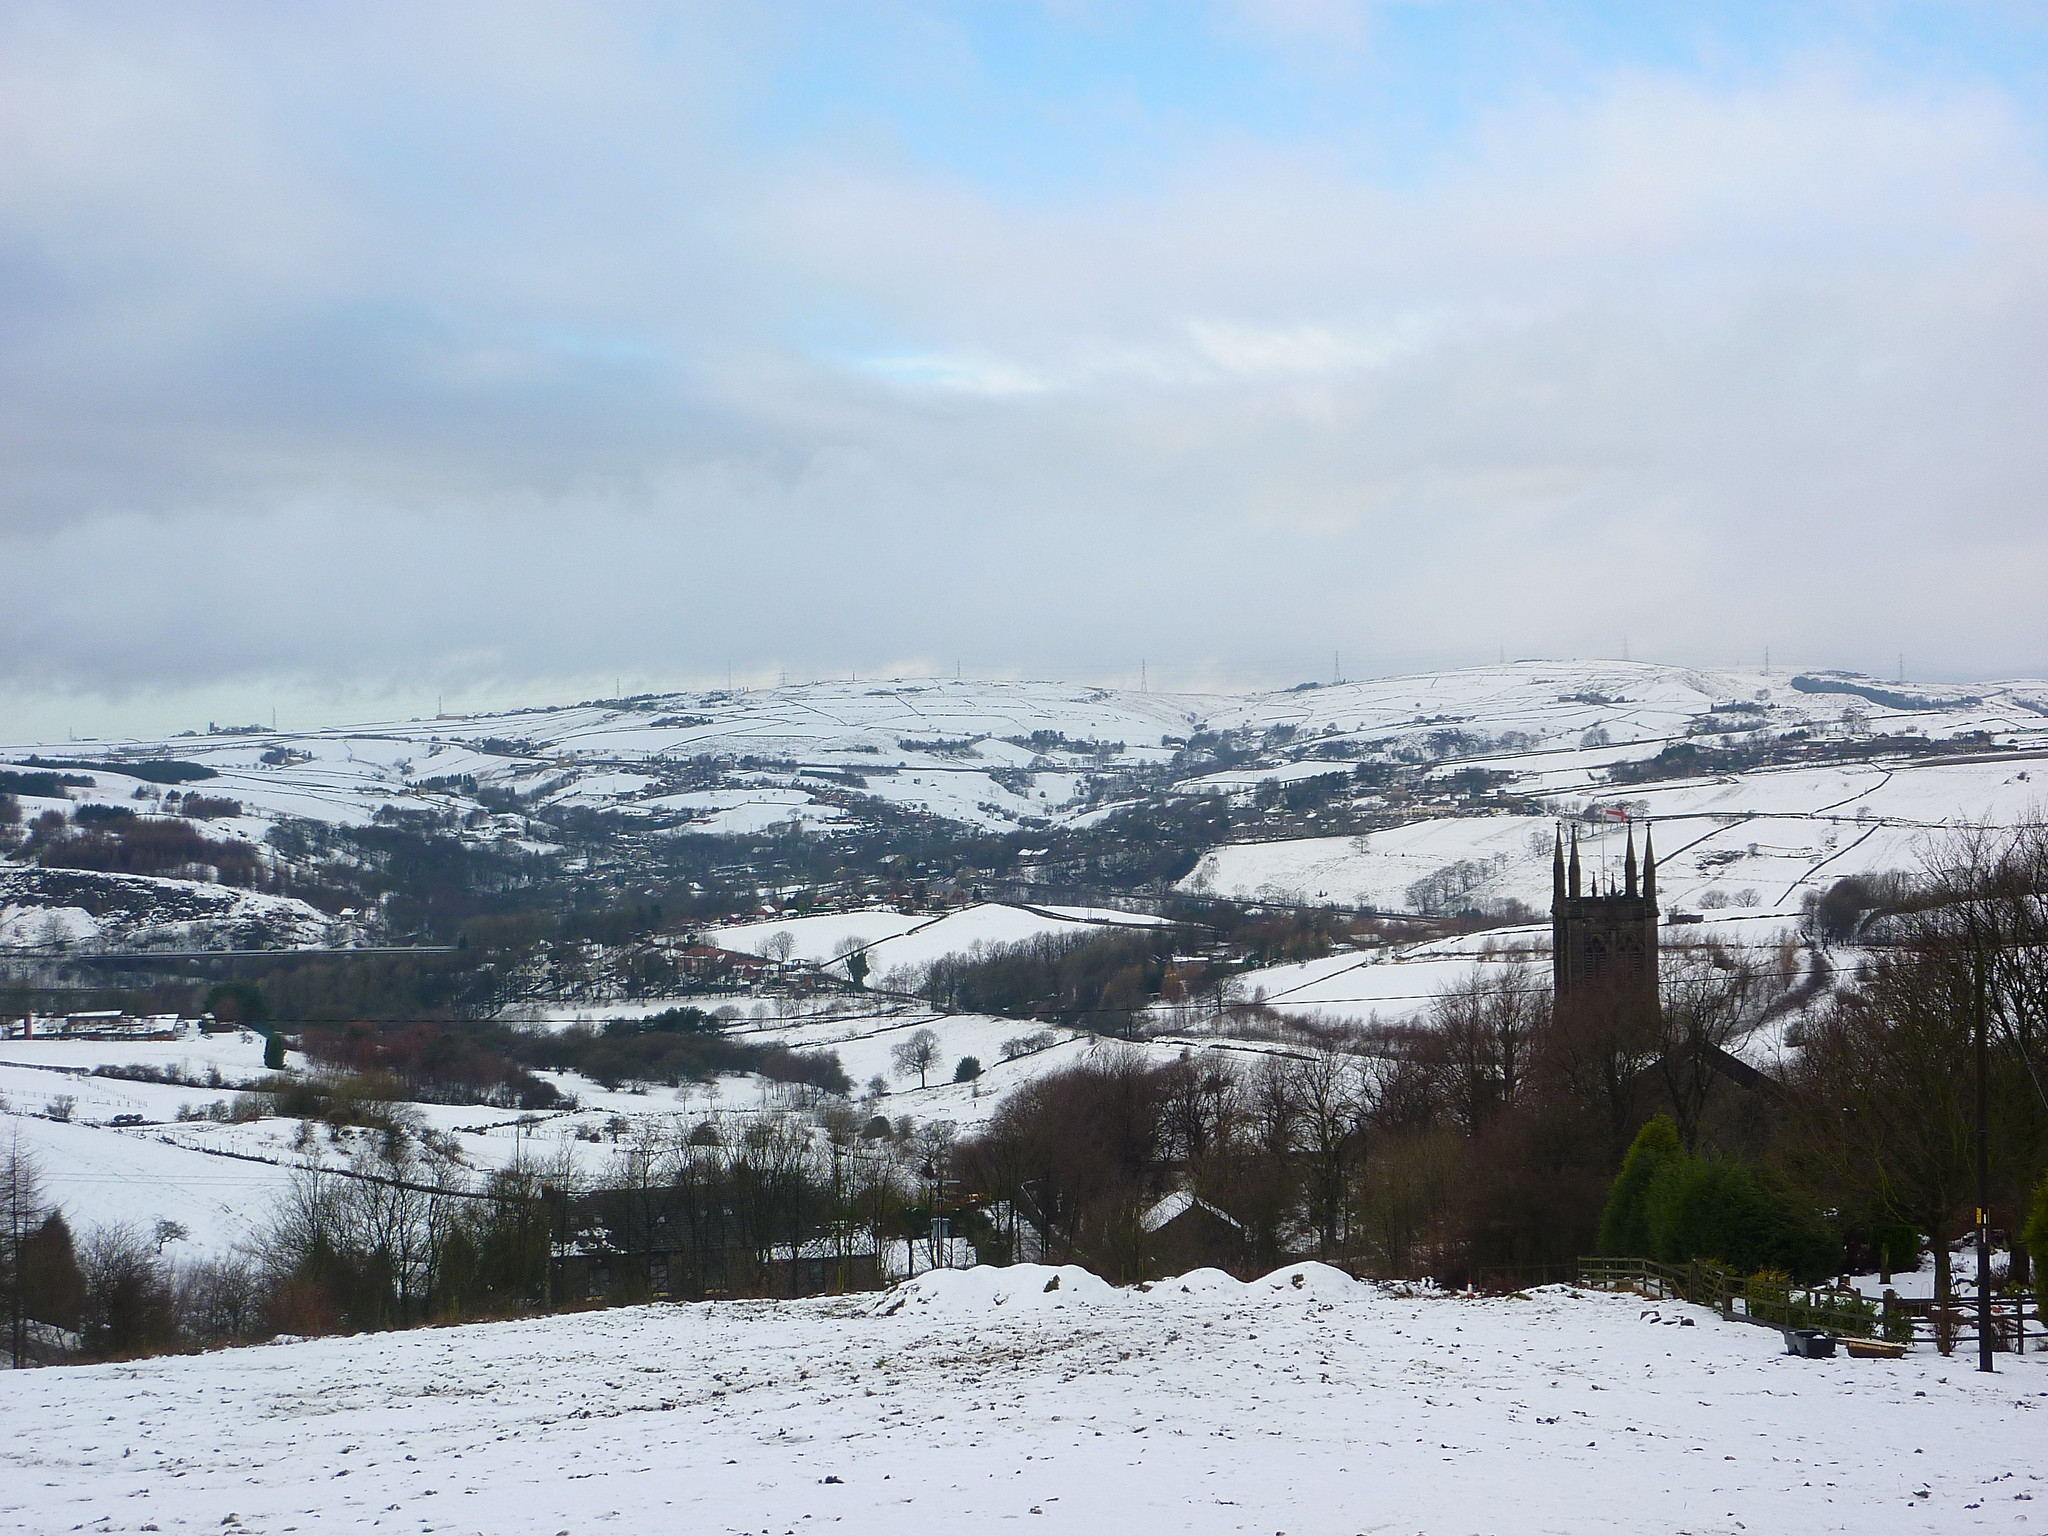 The snowy landscape near St Chad's Church, Saddleworth